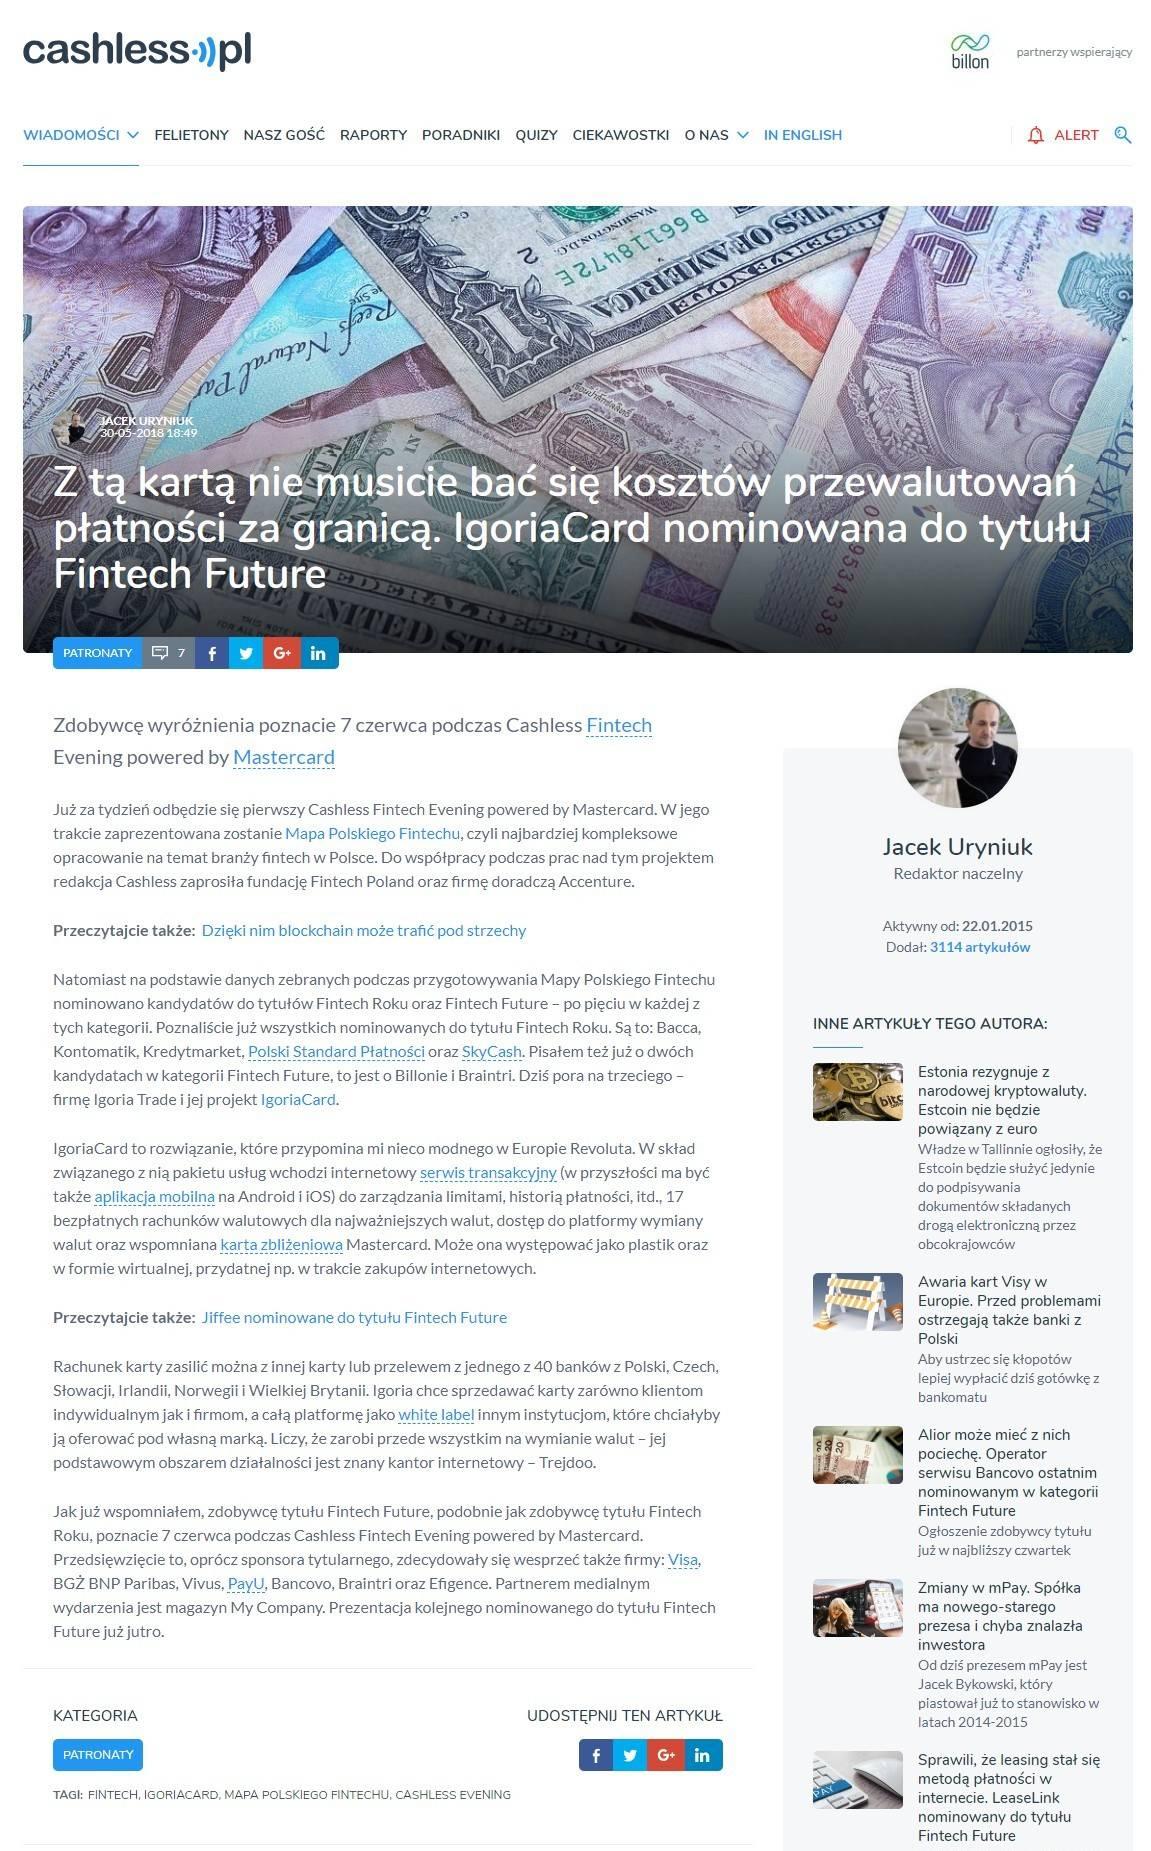 Cashless.pl Mastercard nagroda Fintech Future nominacja